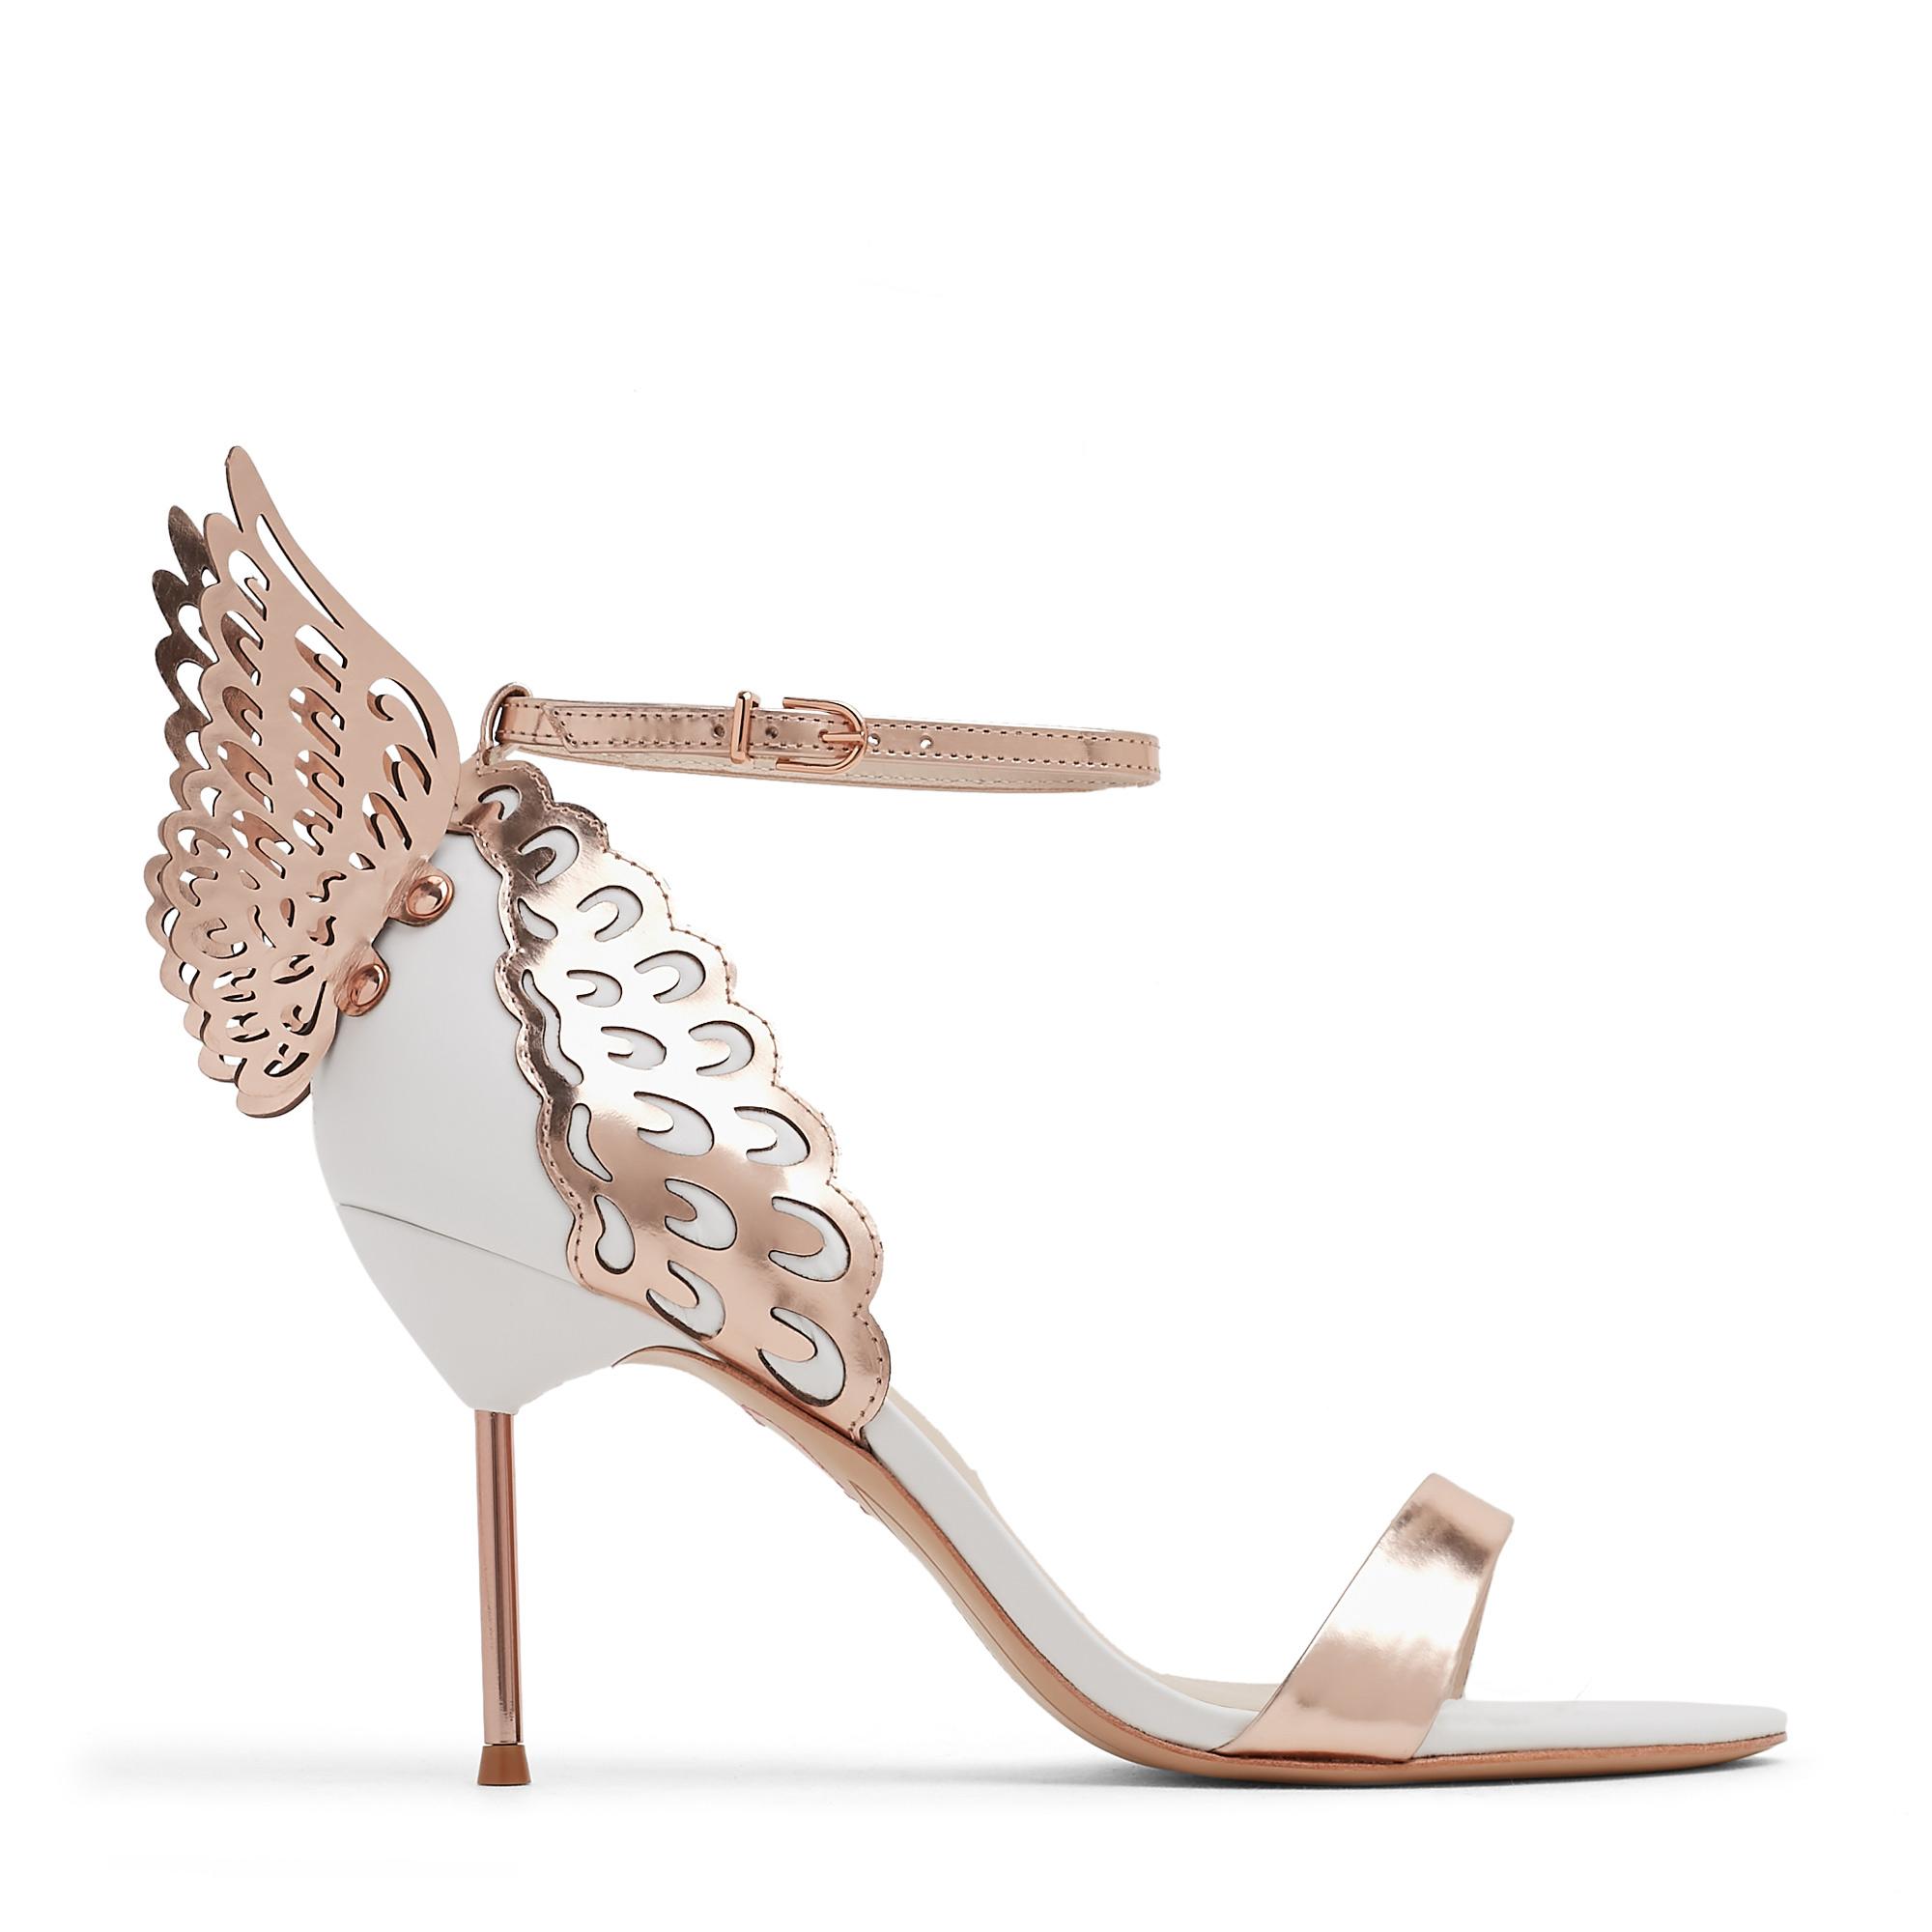 Evangeline sandals